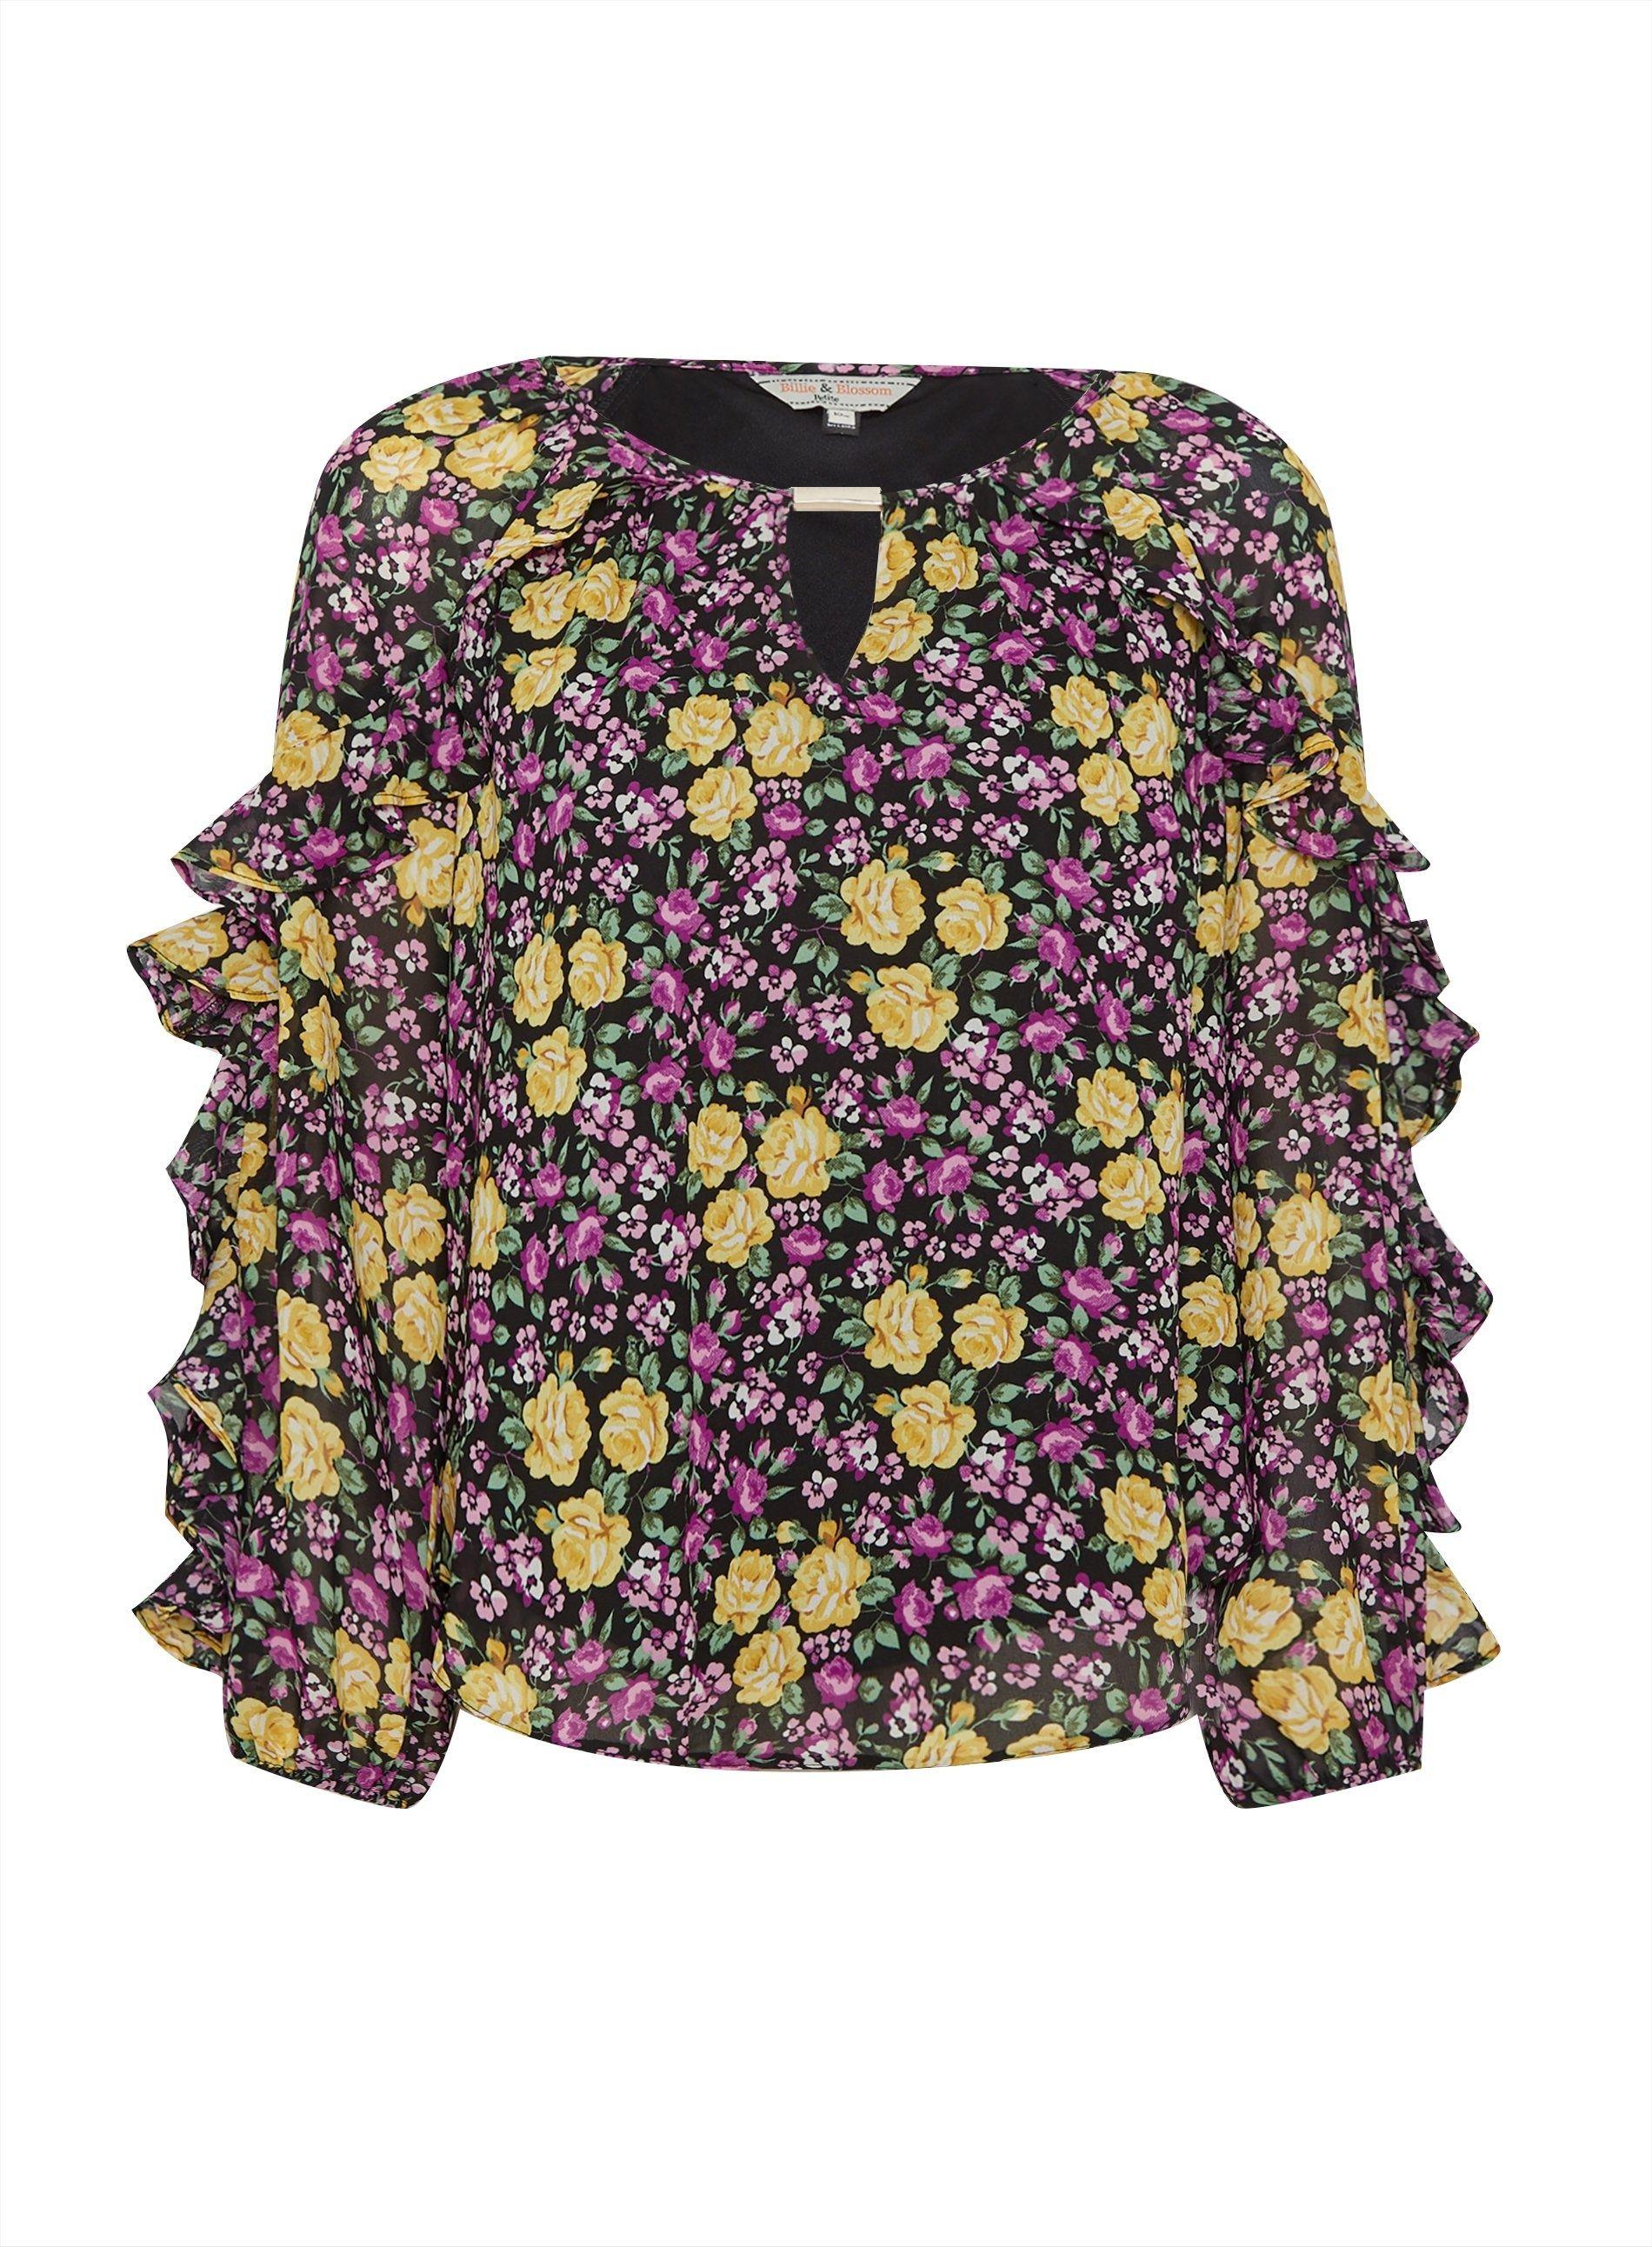 Dorothy Perkins Womens Petite Black Long Sleeve Floral Chiffon Trim Blouse